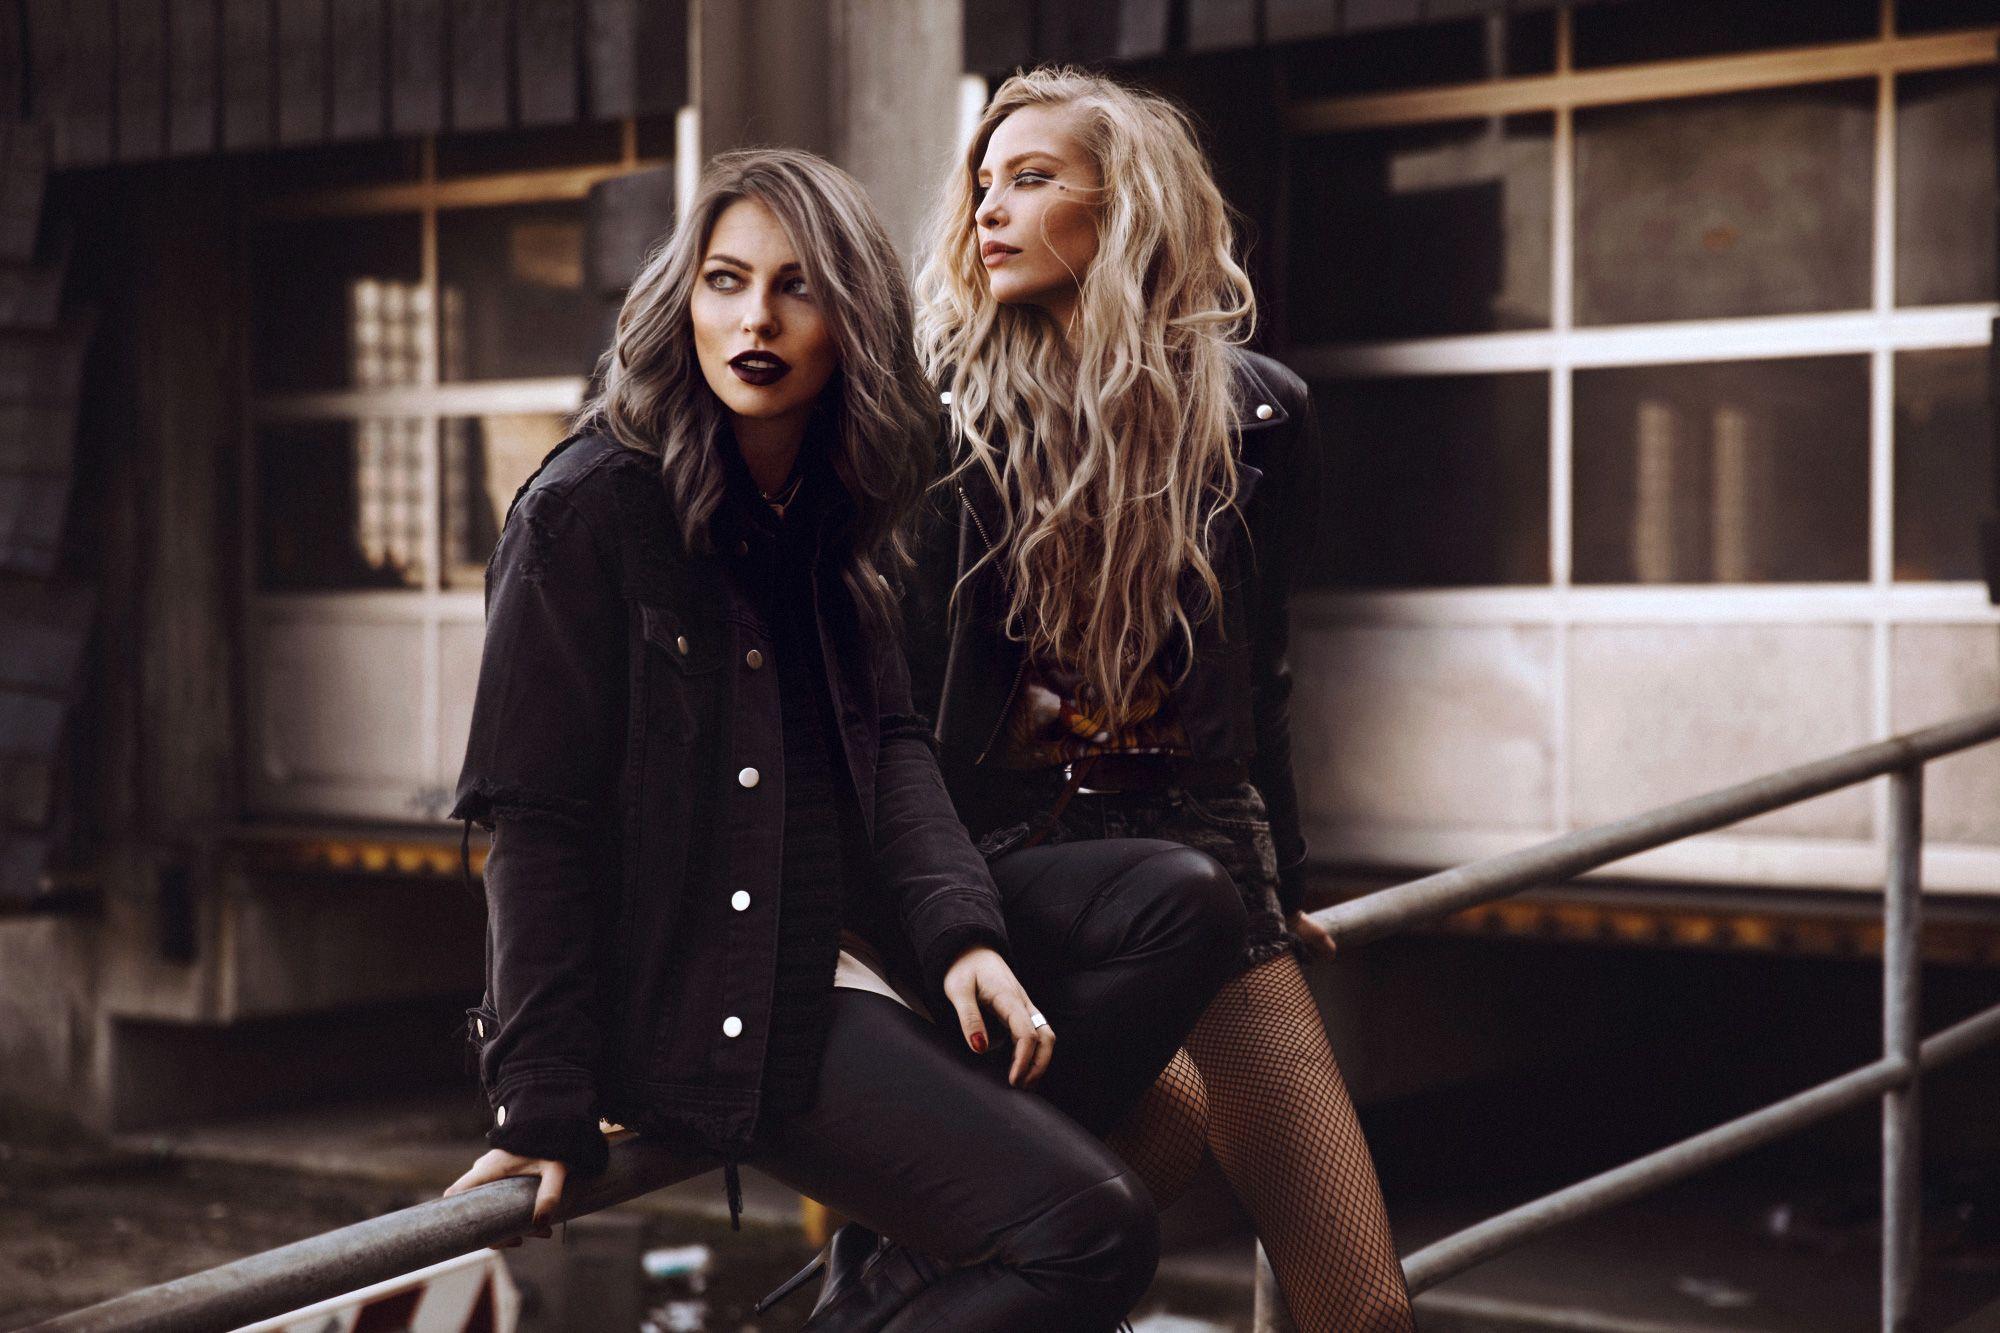 Masha-Lina-grey-hair-best-friends-2